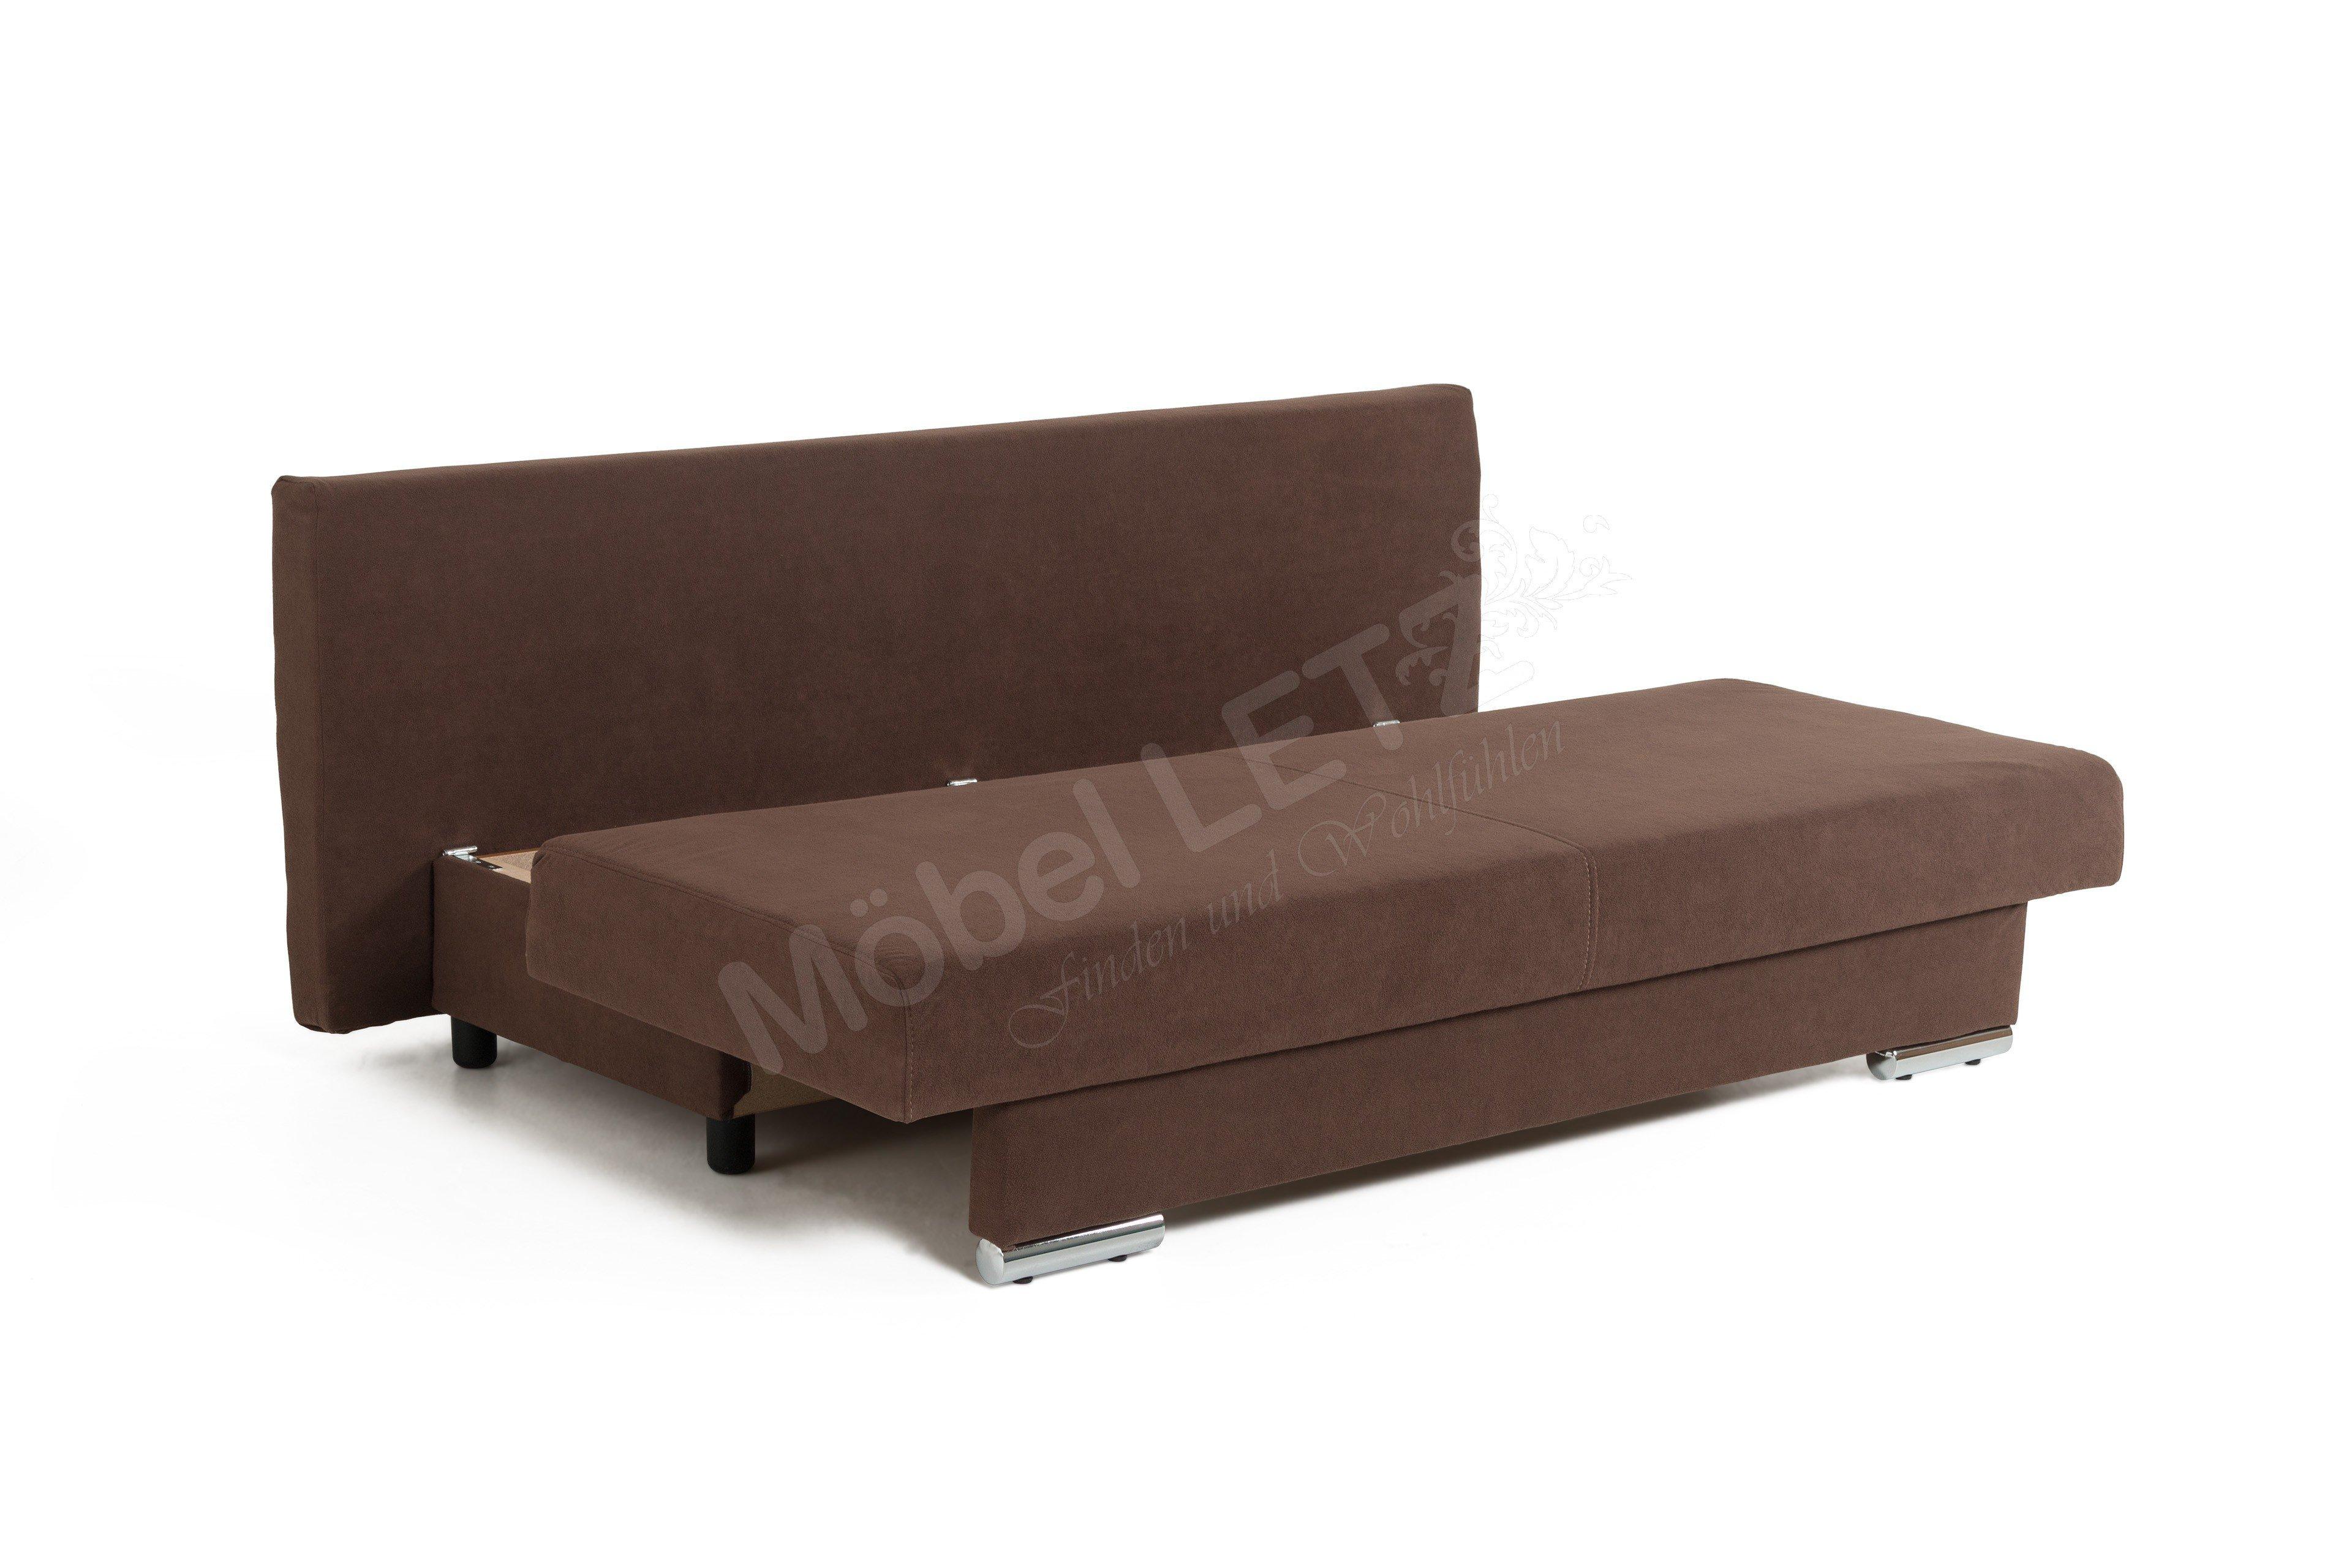 jockenh fer griffin angel schlafsofa in braun m bel letz ihr online shop. Black Bedroom Furniture Sets. Home Design Ideas